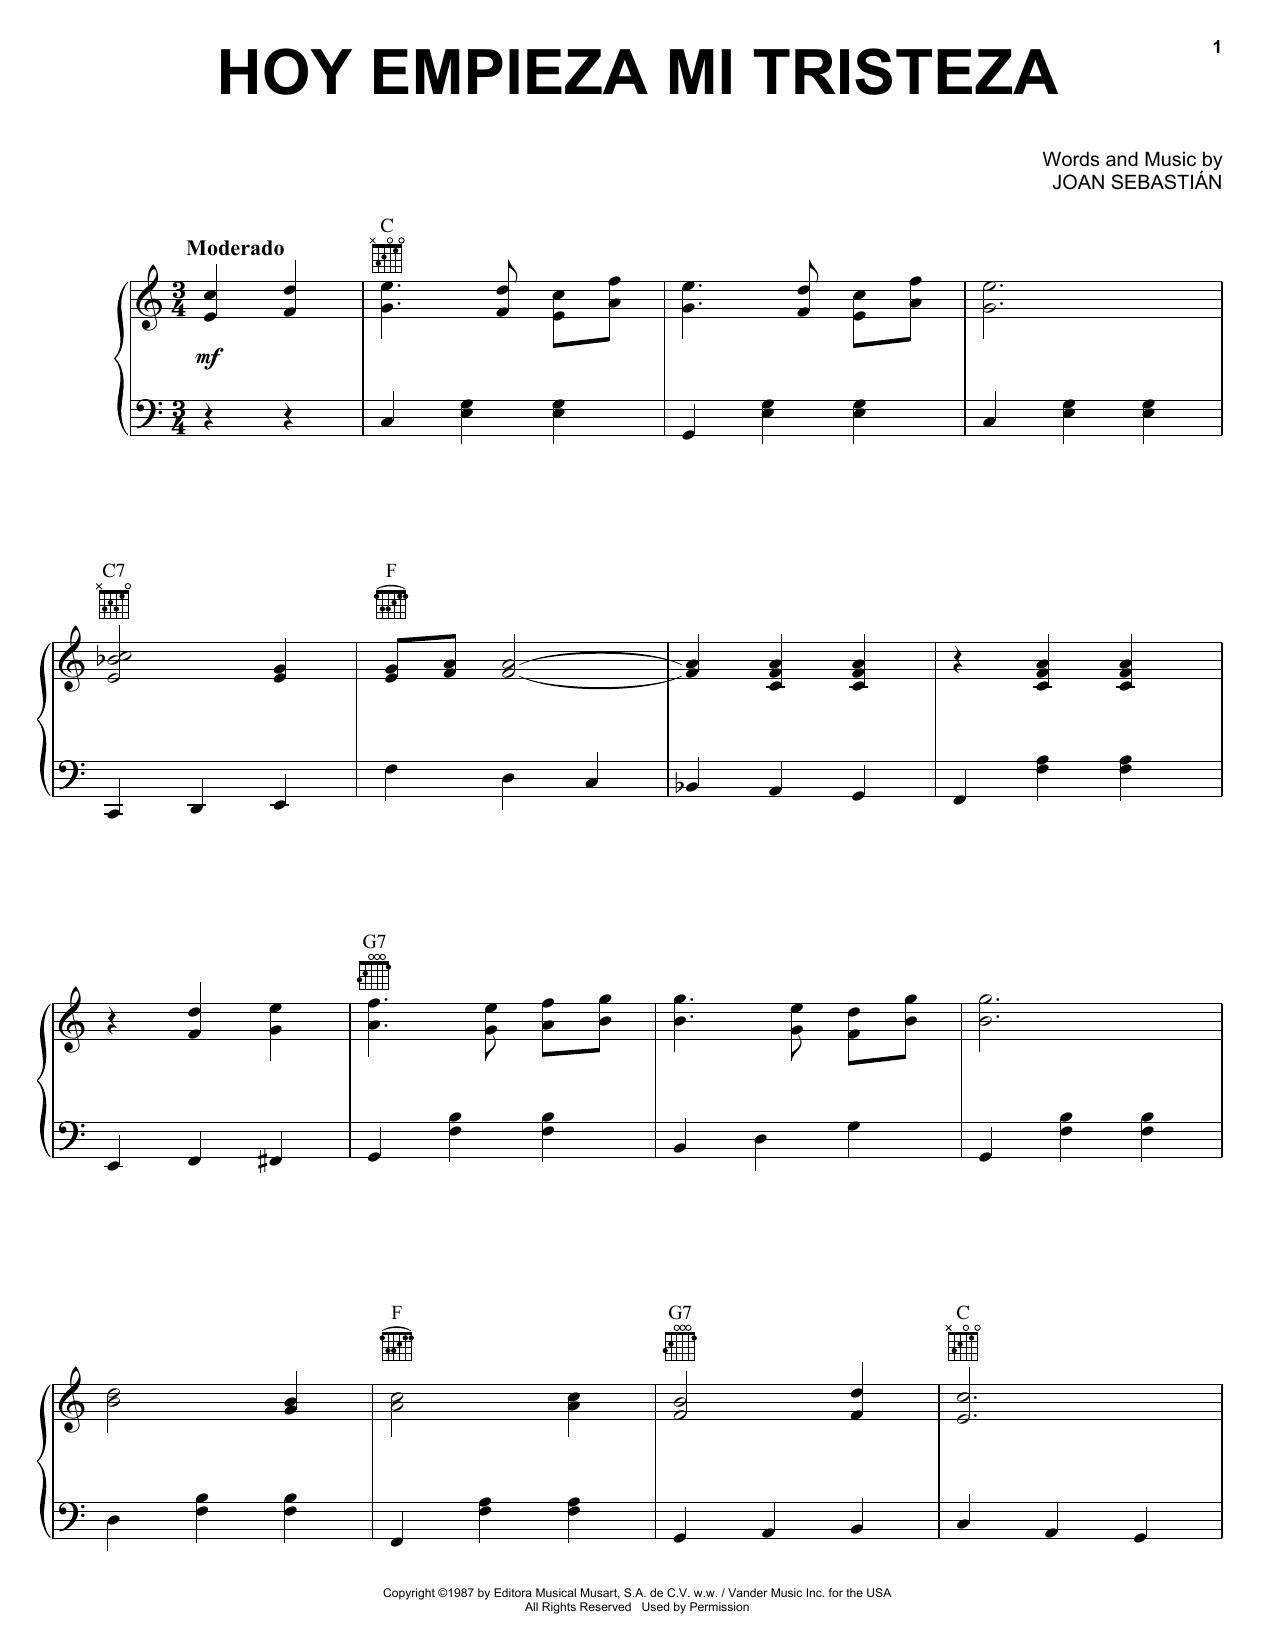 Joan Sebastián - Hoy Empieza Mi Tristeza